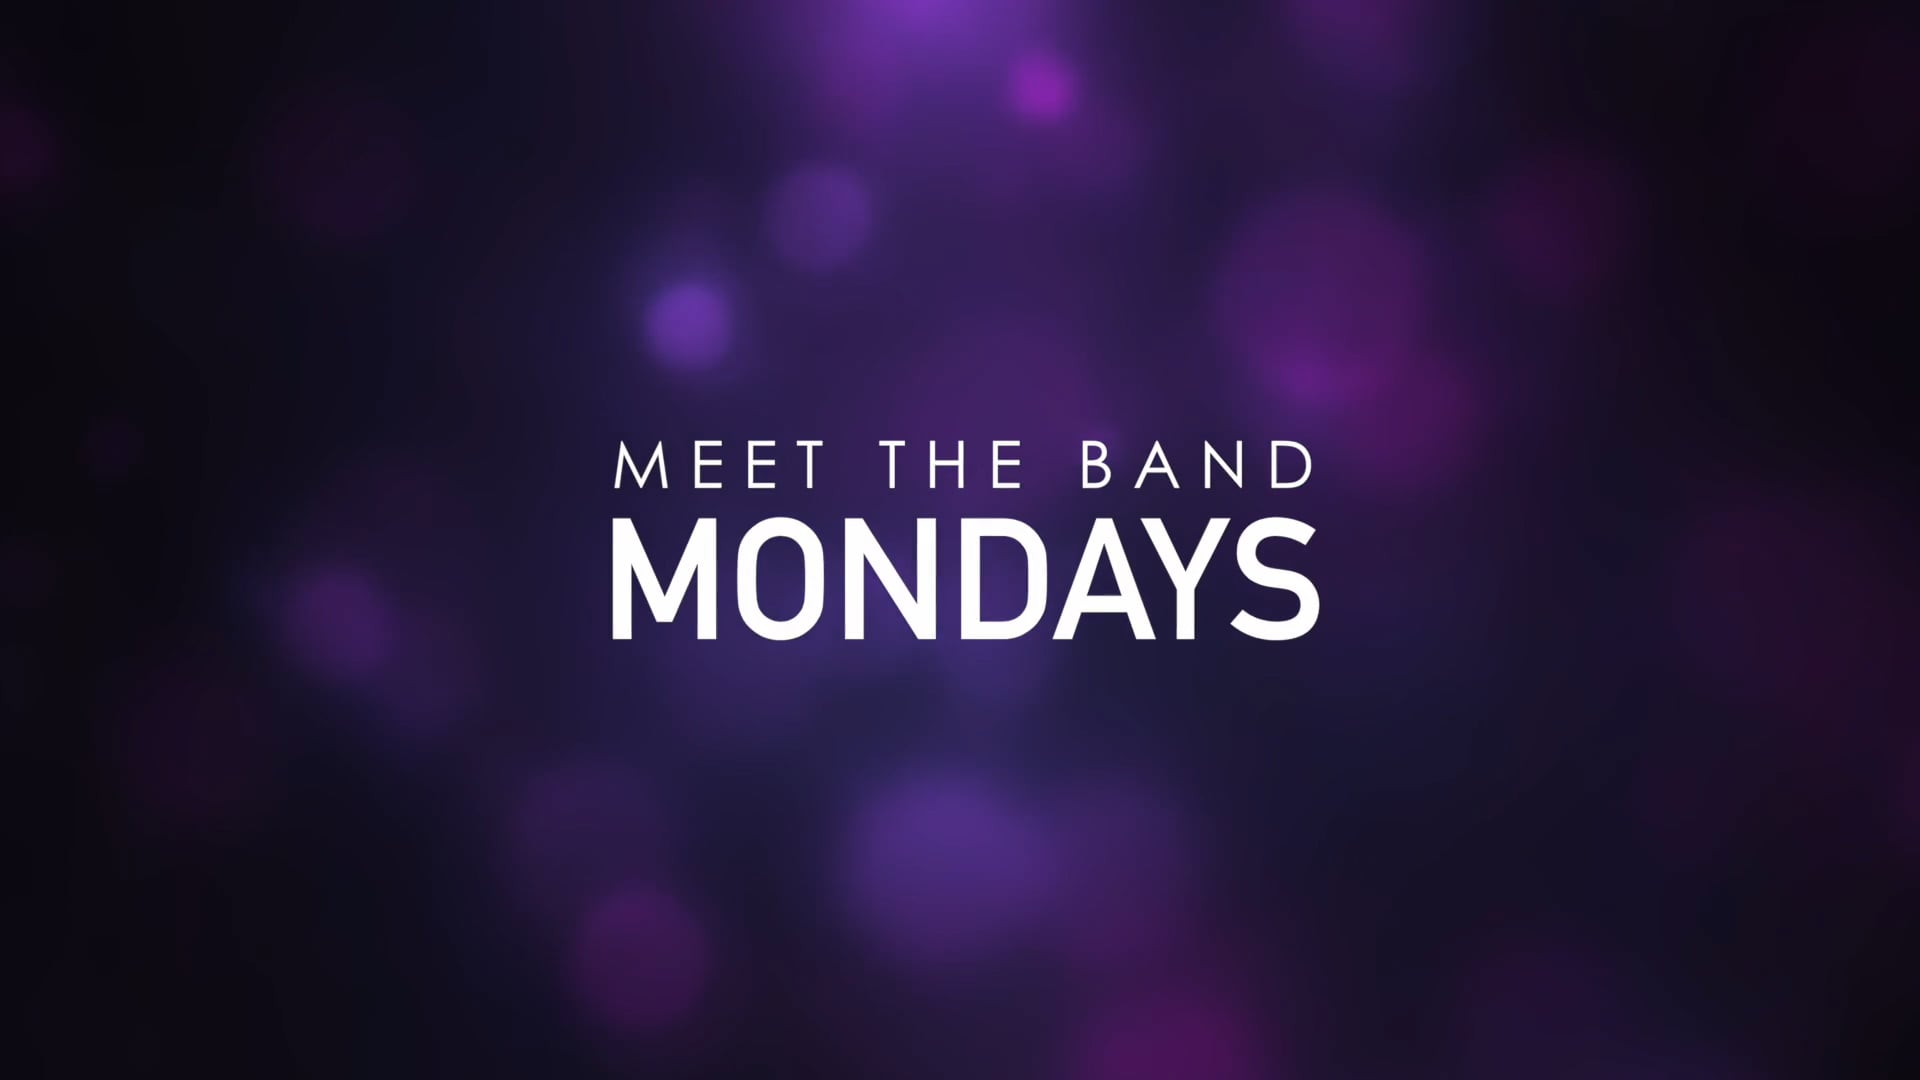 Meet The Band Mondays